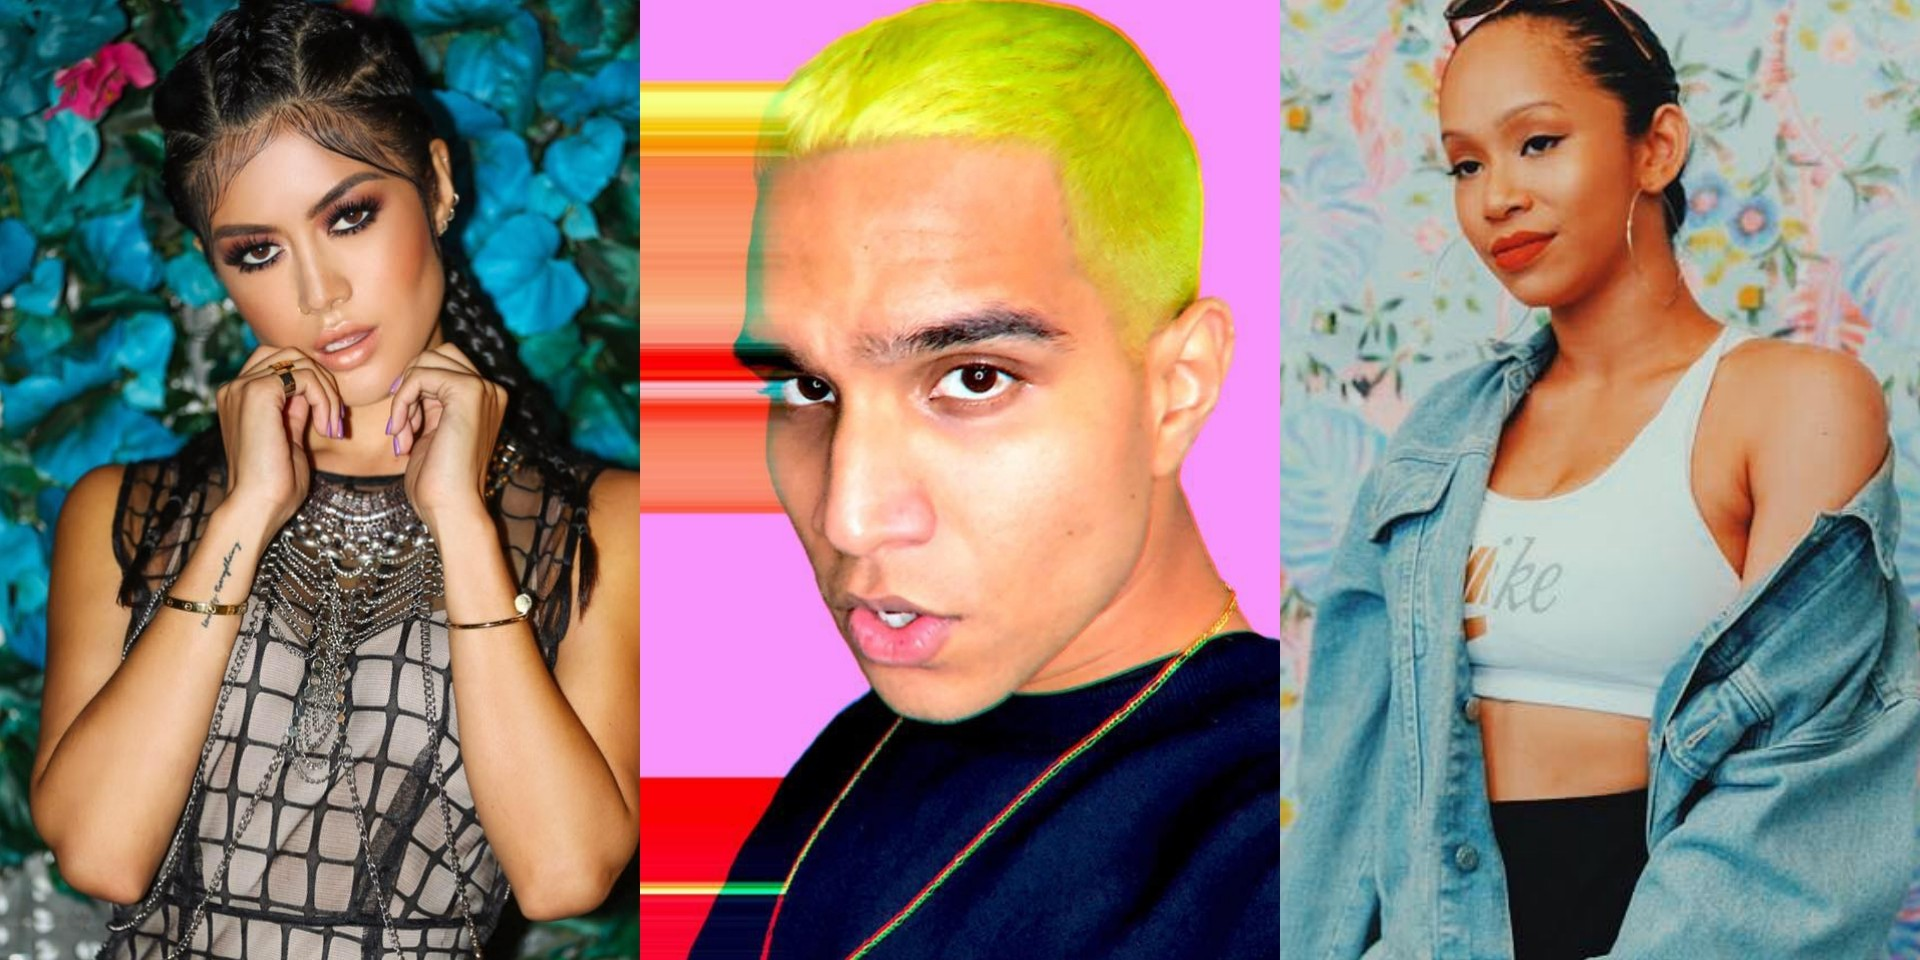 YO! MTV RAPS returns in Asia with Kim Lee, Yung Raja, Zamaera and more